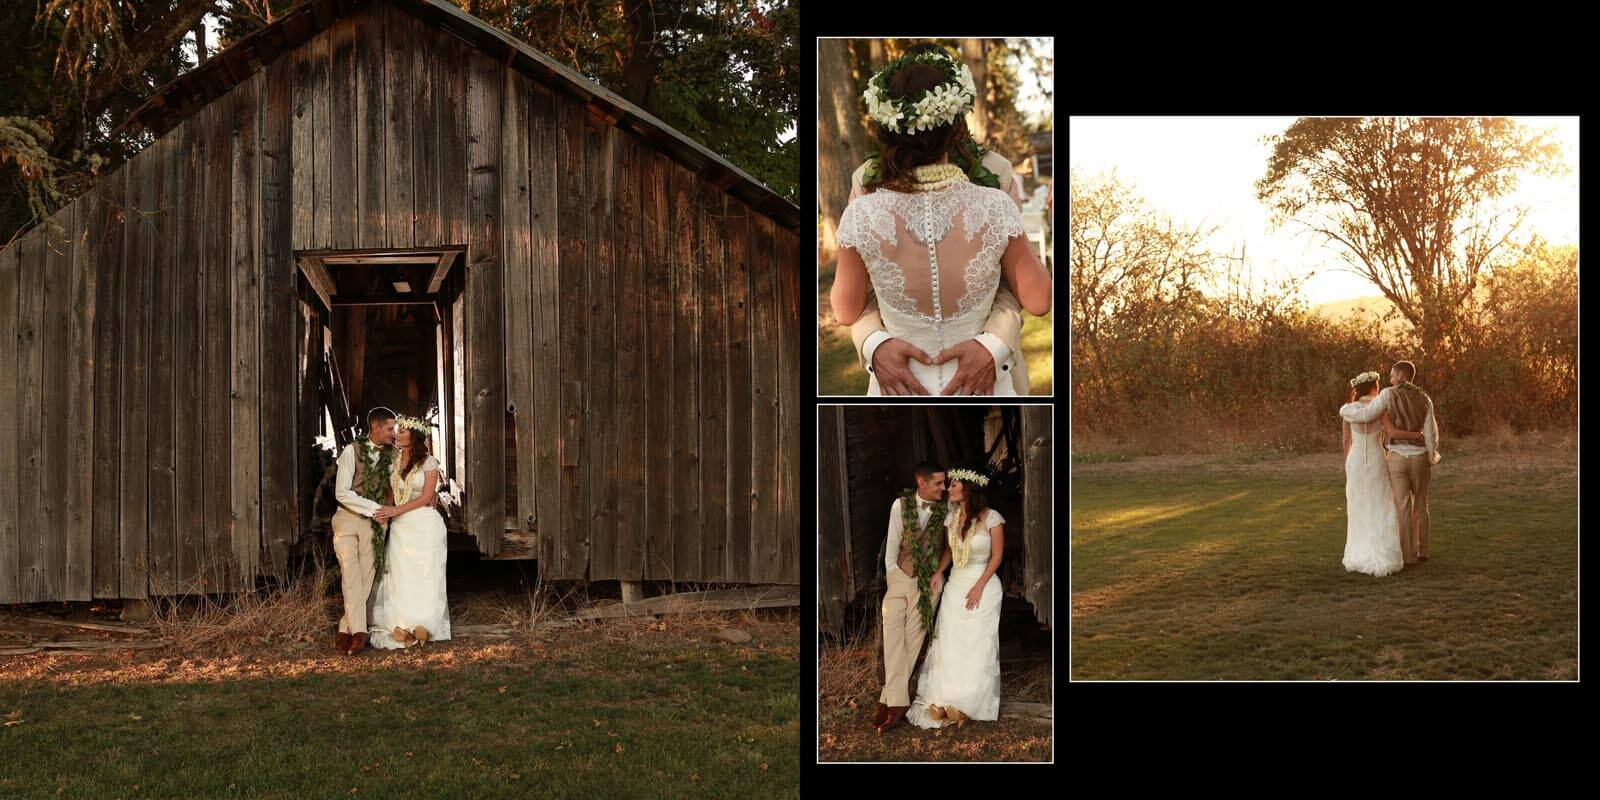 Jasper-House-Farm-Outdoor-Wedding-Lane-County-Oregon-photographers-062-063.jpg